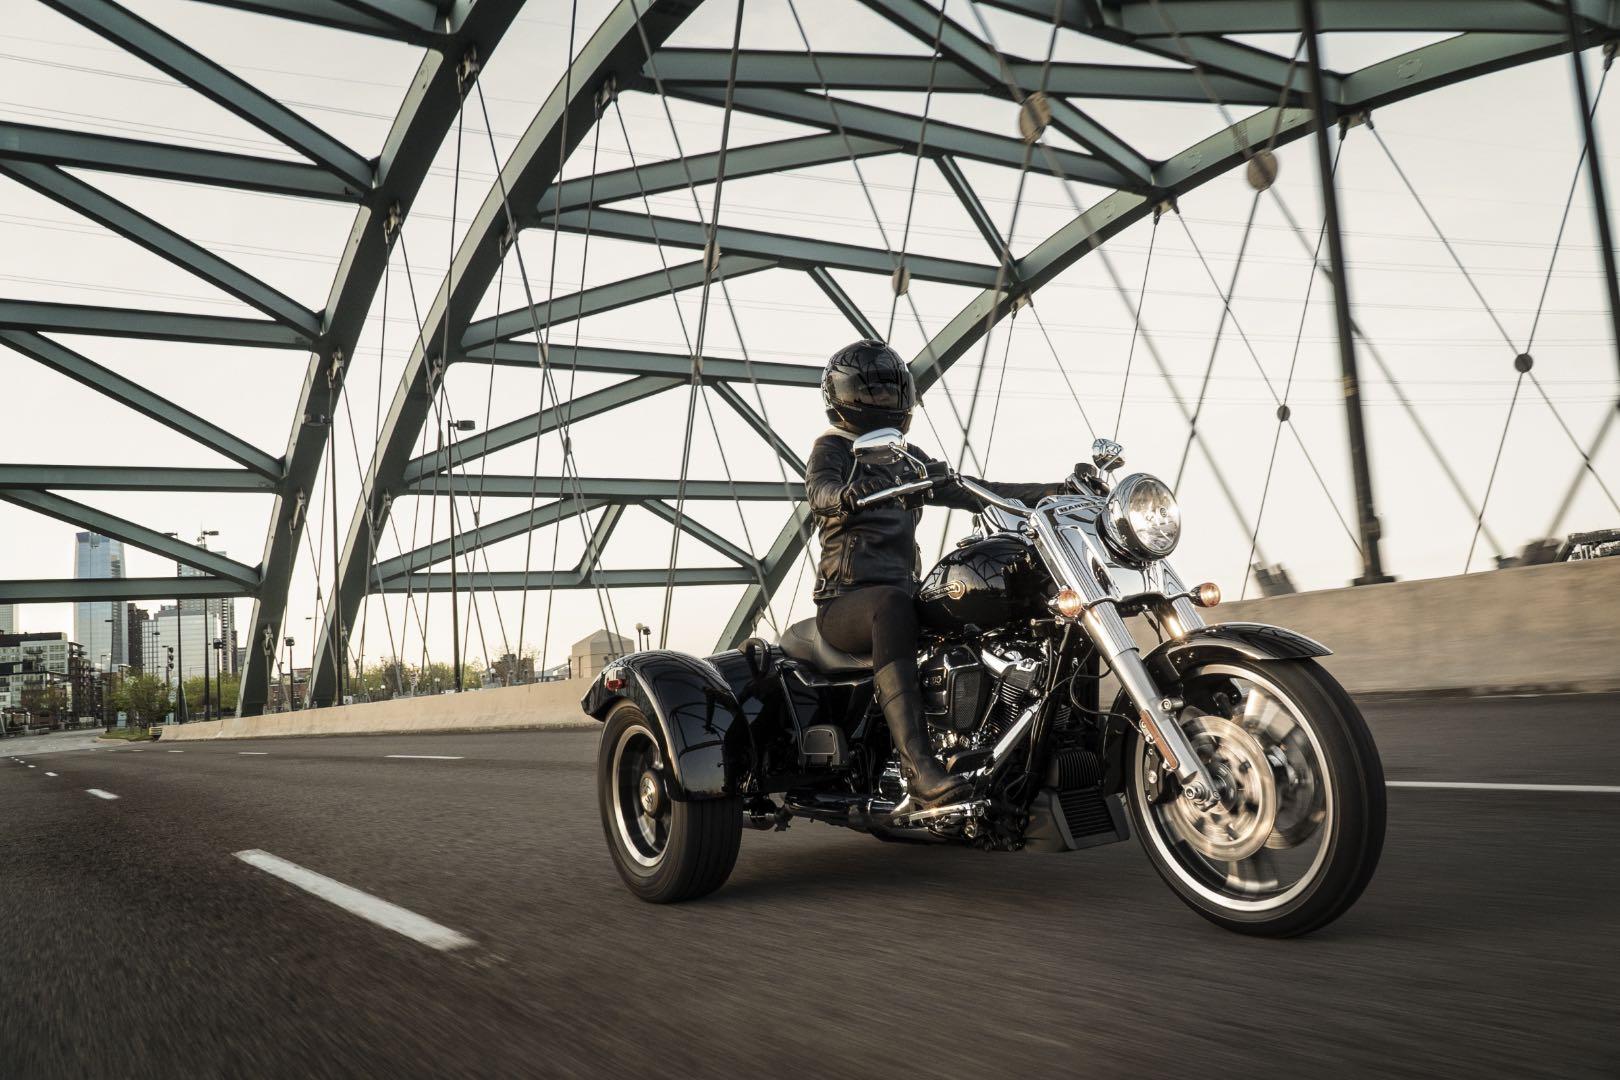 2019 Harley-Davidson Trike Updates (Tri Glide Ultra